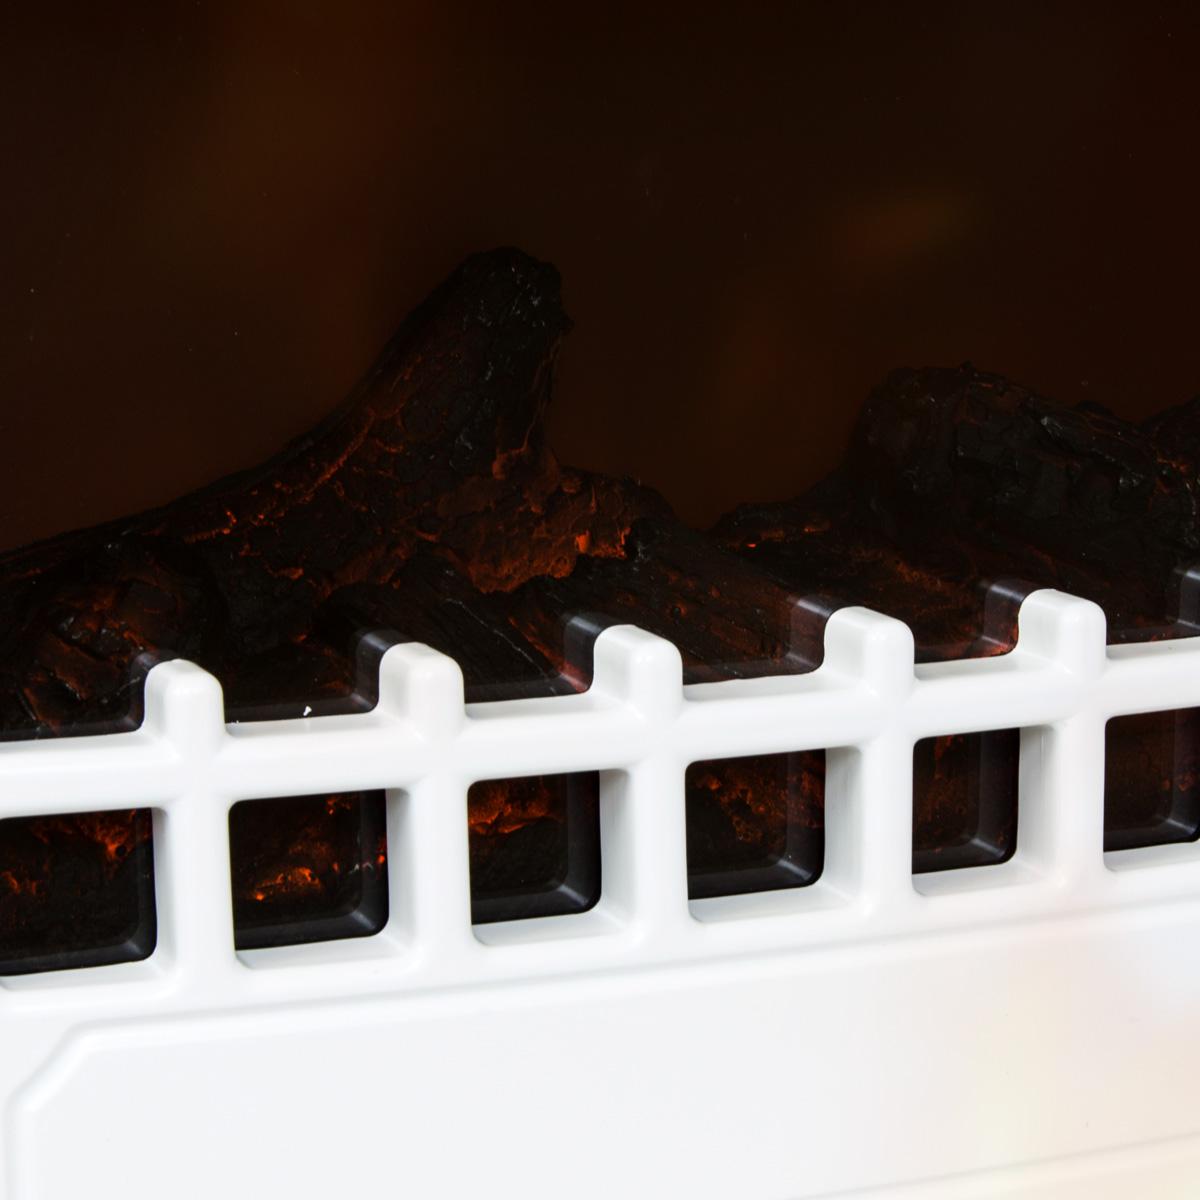 Charles bentley freestanding electric fire stove log flame - Estufas electricas efecto llama ...